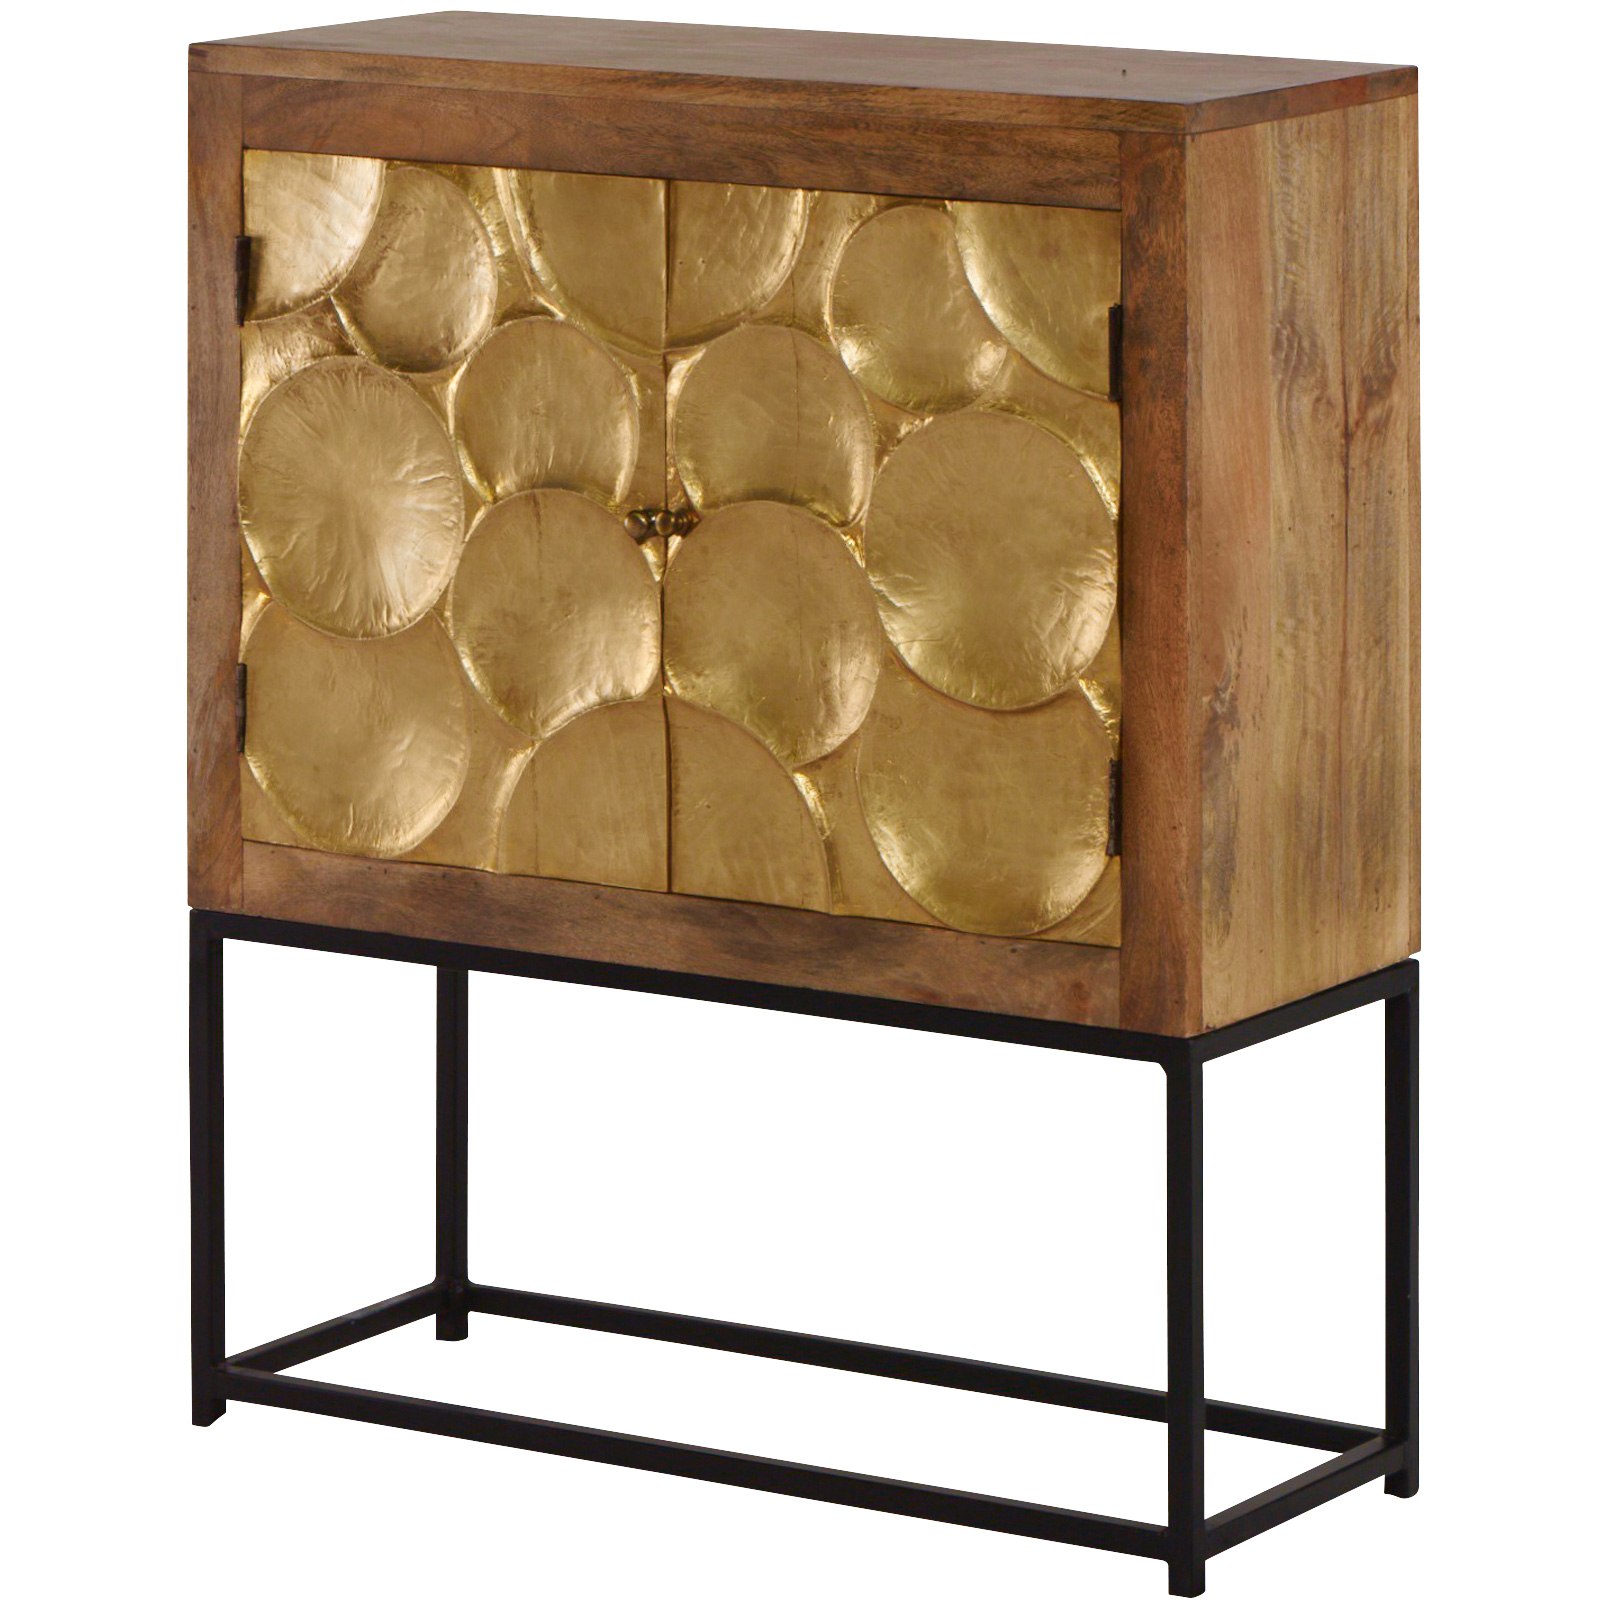 Jaipur Home LLC | Urban Composition Golden Cabinet | Black